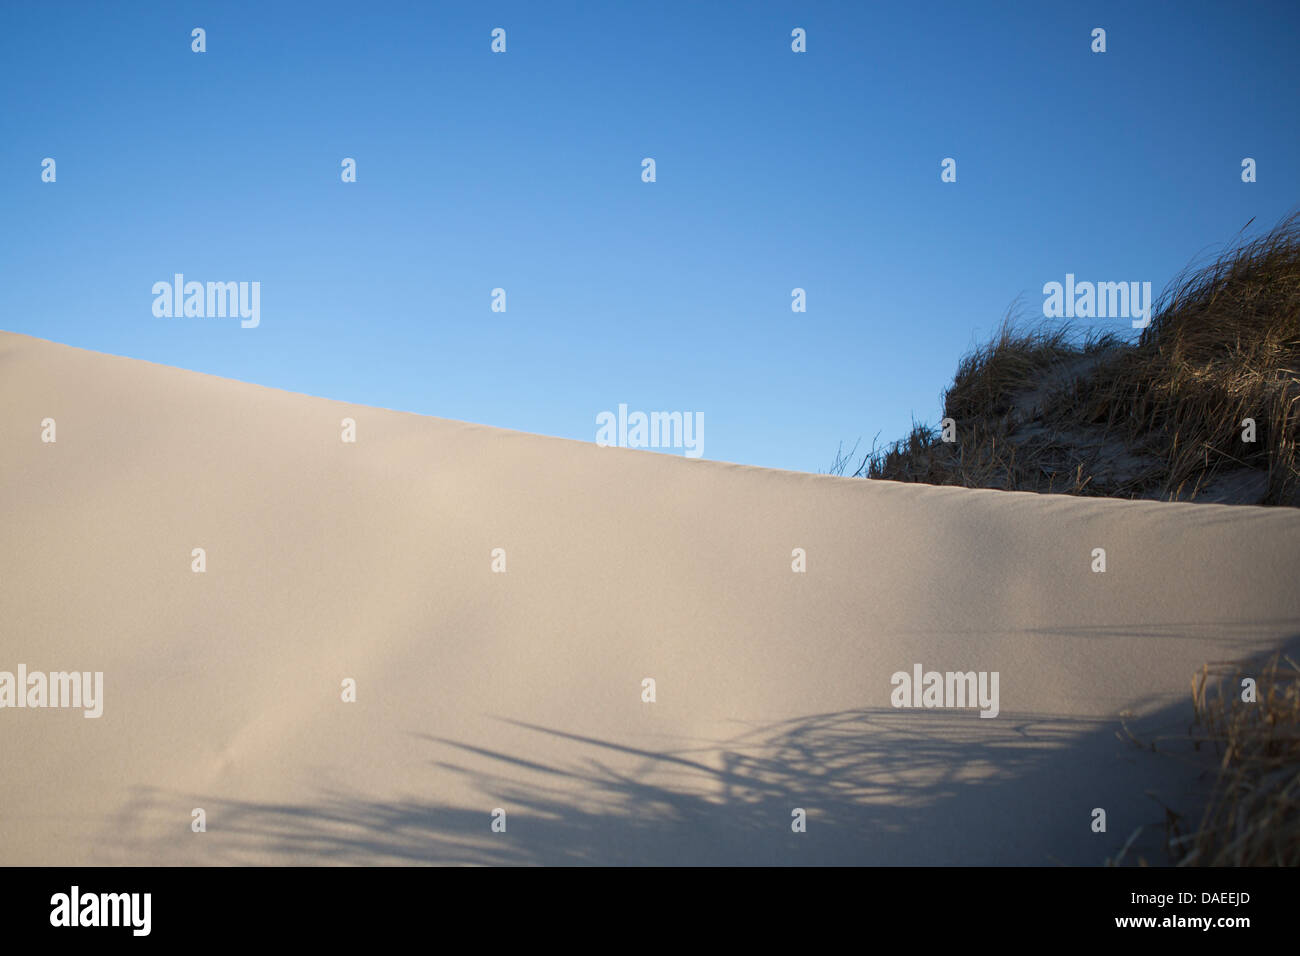 Sanddüne, blauer Himmel, einige vegitation Stockbild